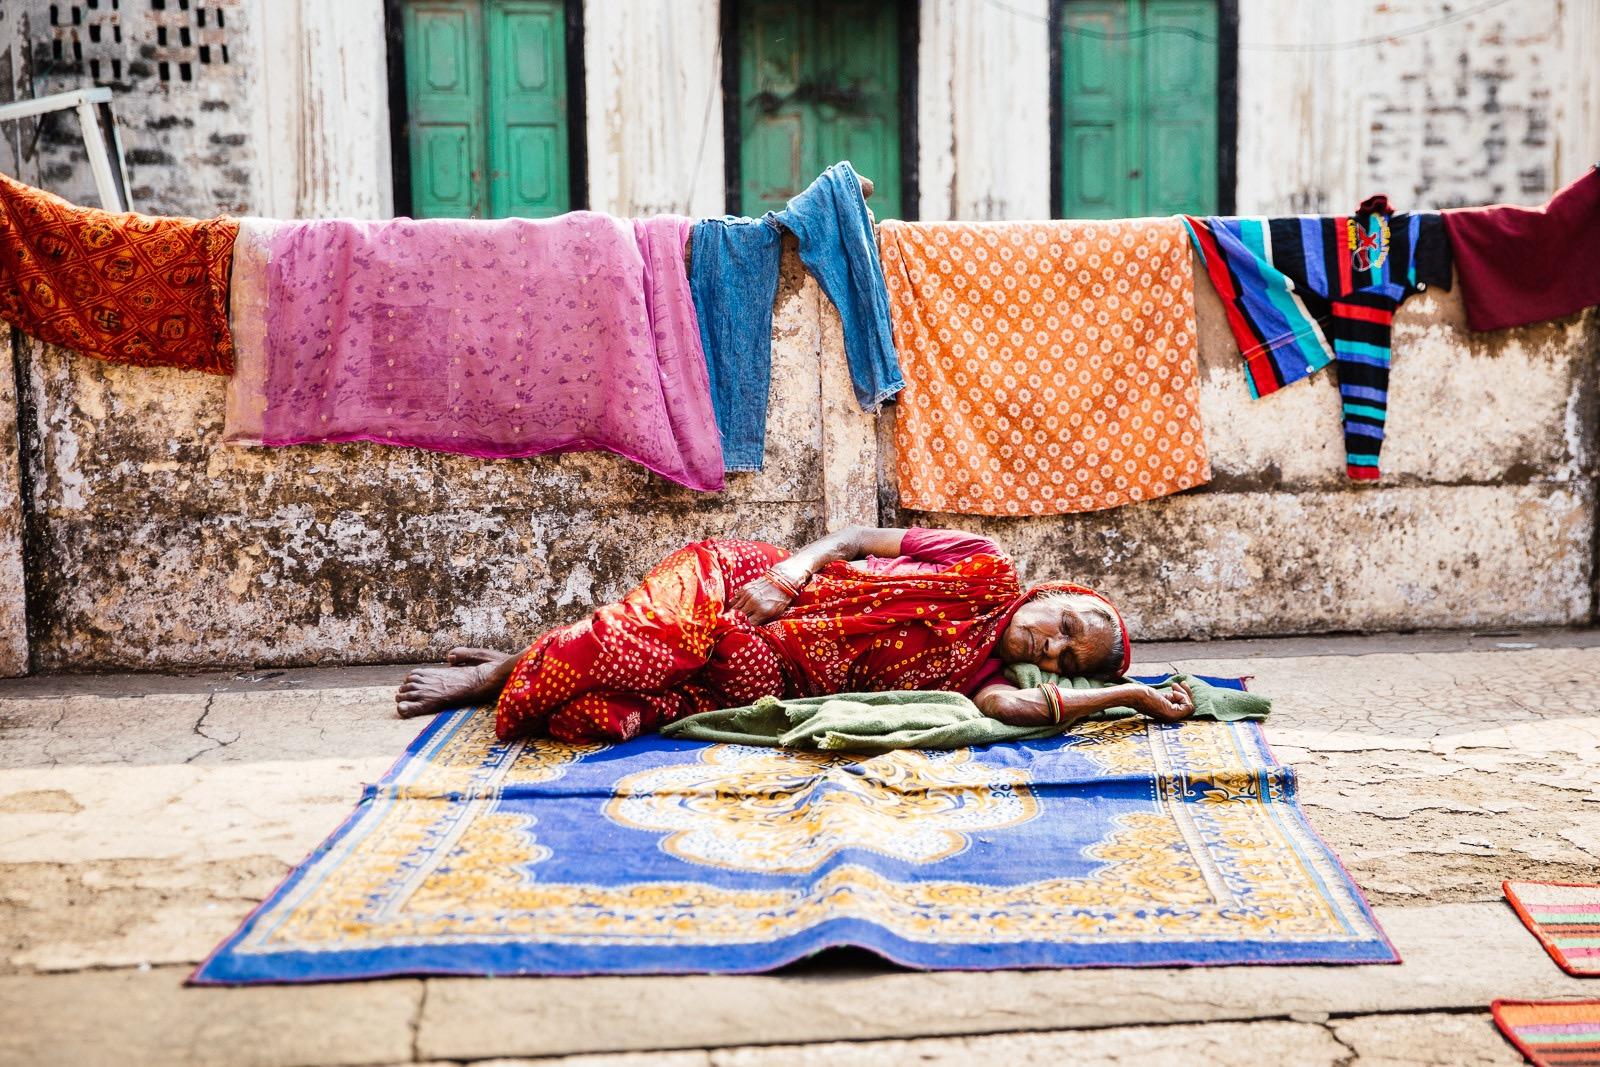 a86f506f5879b63a-varanasi-india-travel-photos-tanveer-badal-36.jpg